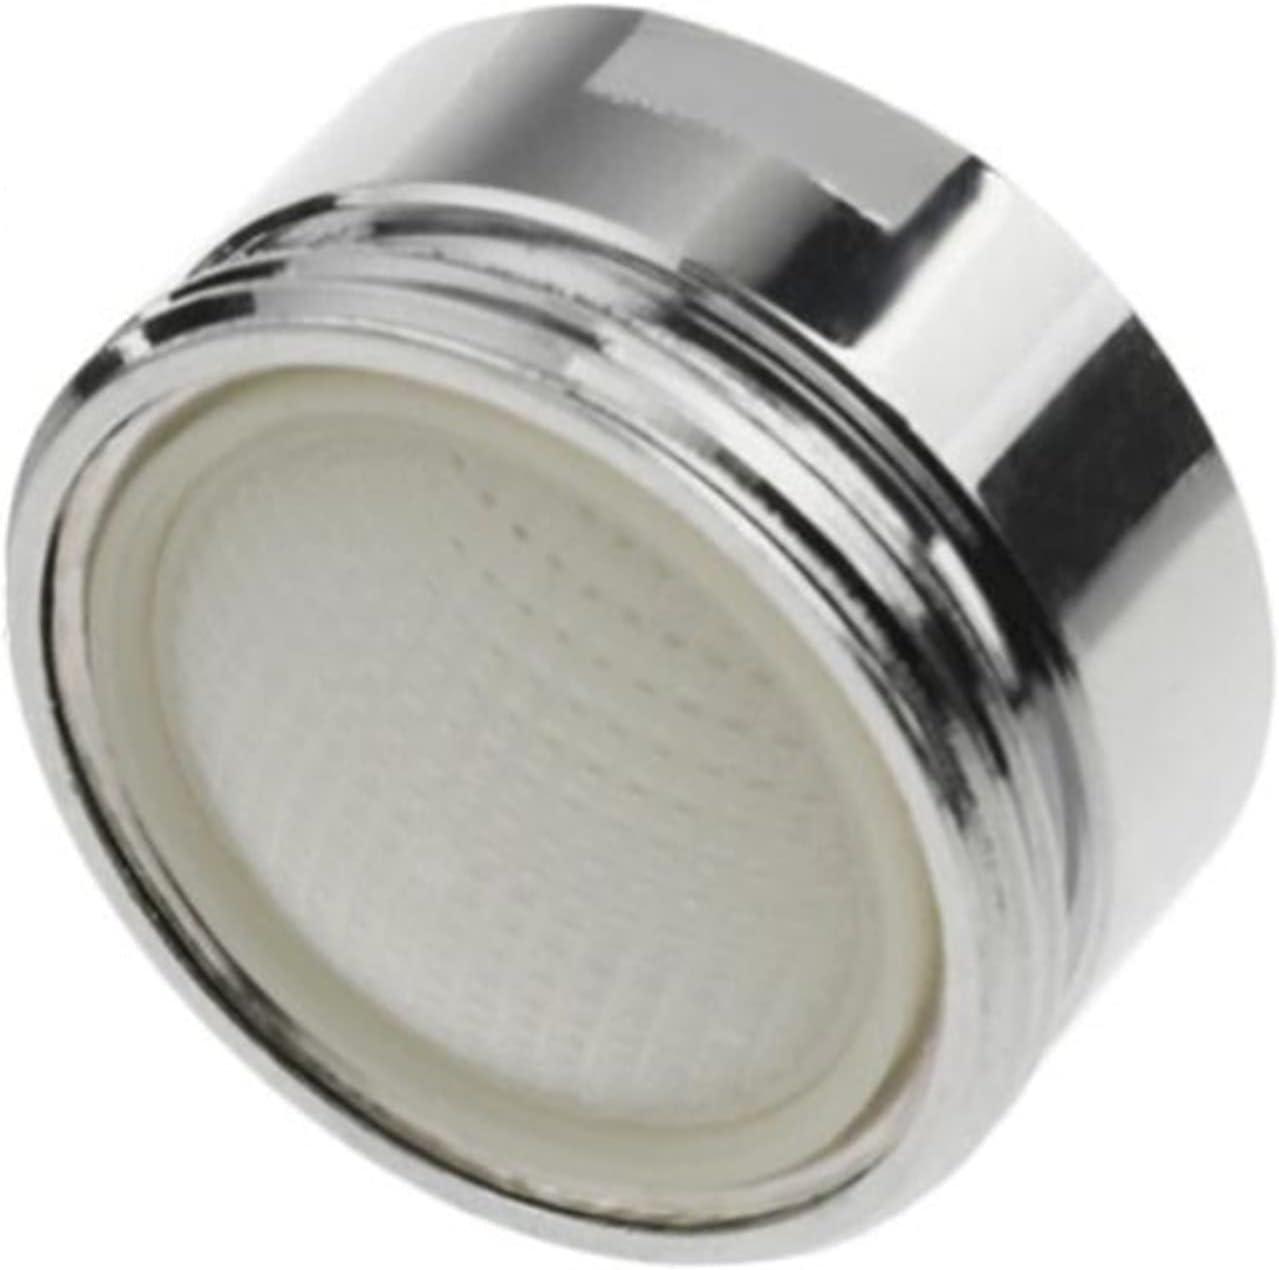 CDHDSYY Faucet Aerator Max 40% OFF 5PCS Saving Tap Water Superlatite Male